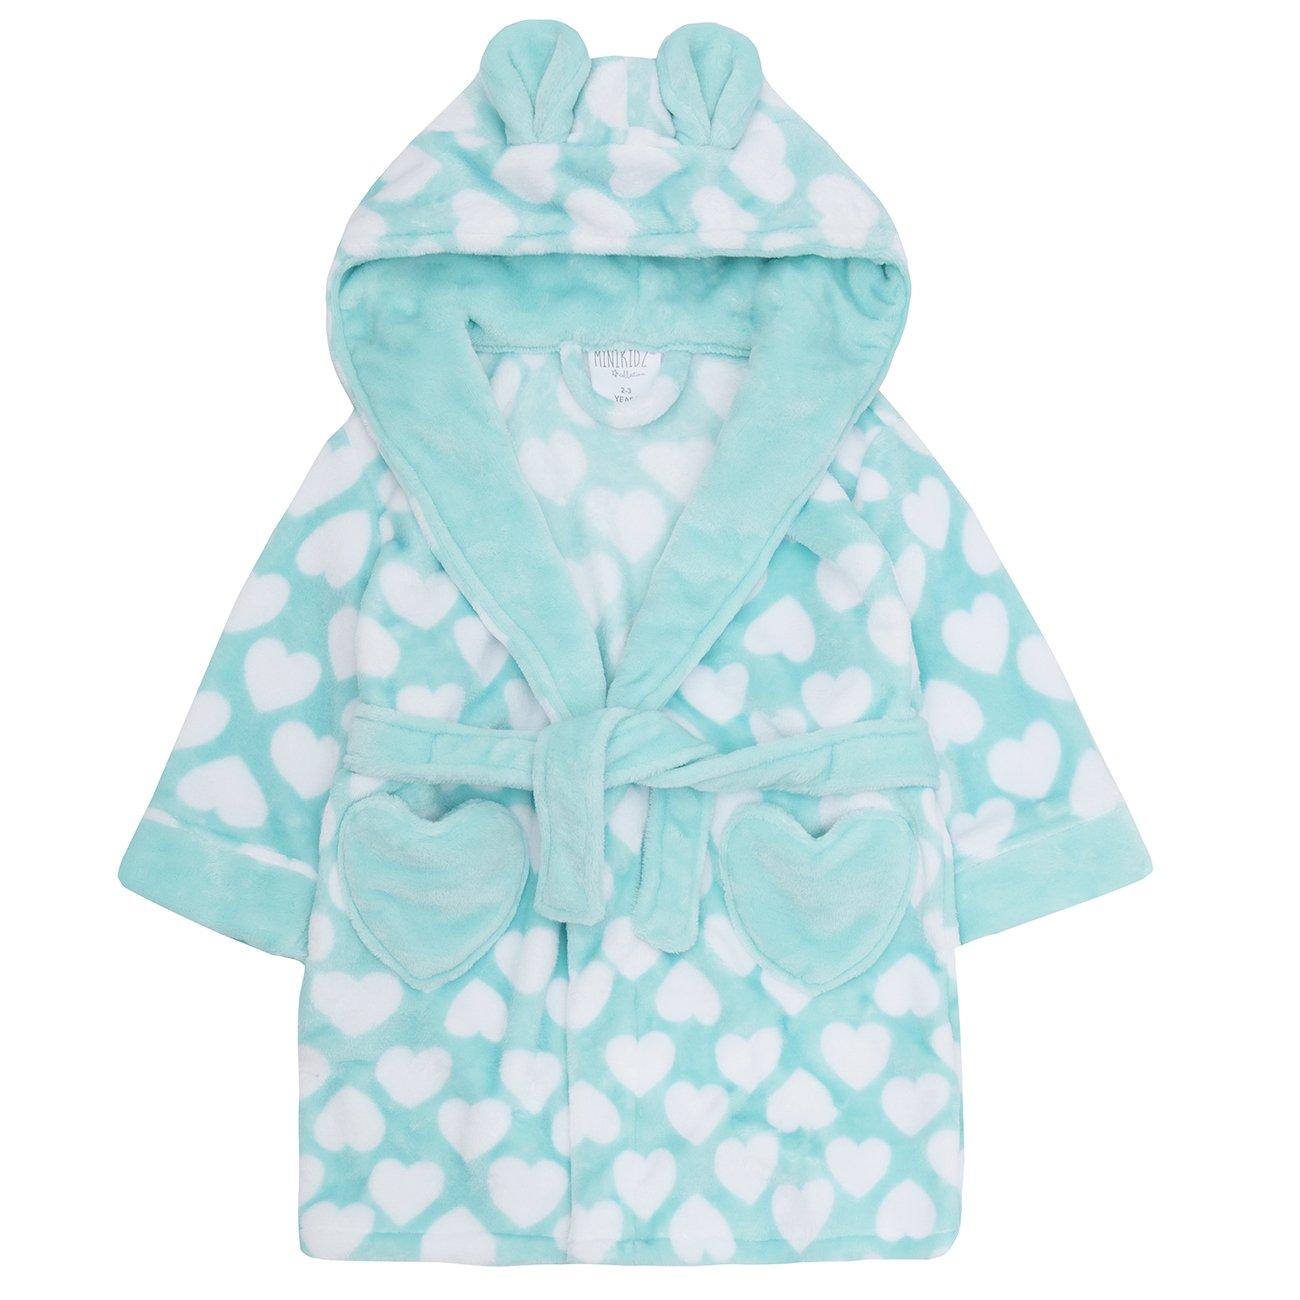 Minikidz Childrens Kids Girls Fleece Dressing Gown - Flannel Fleece Heart Print Hooded Robe